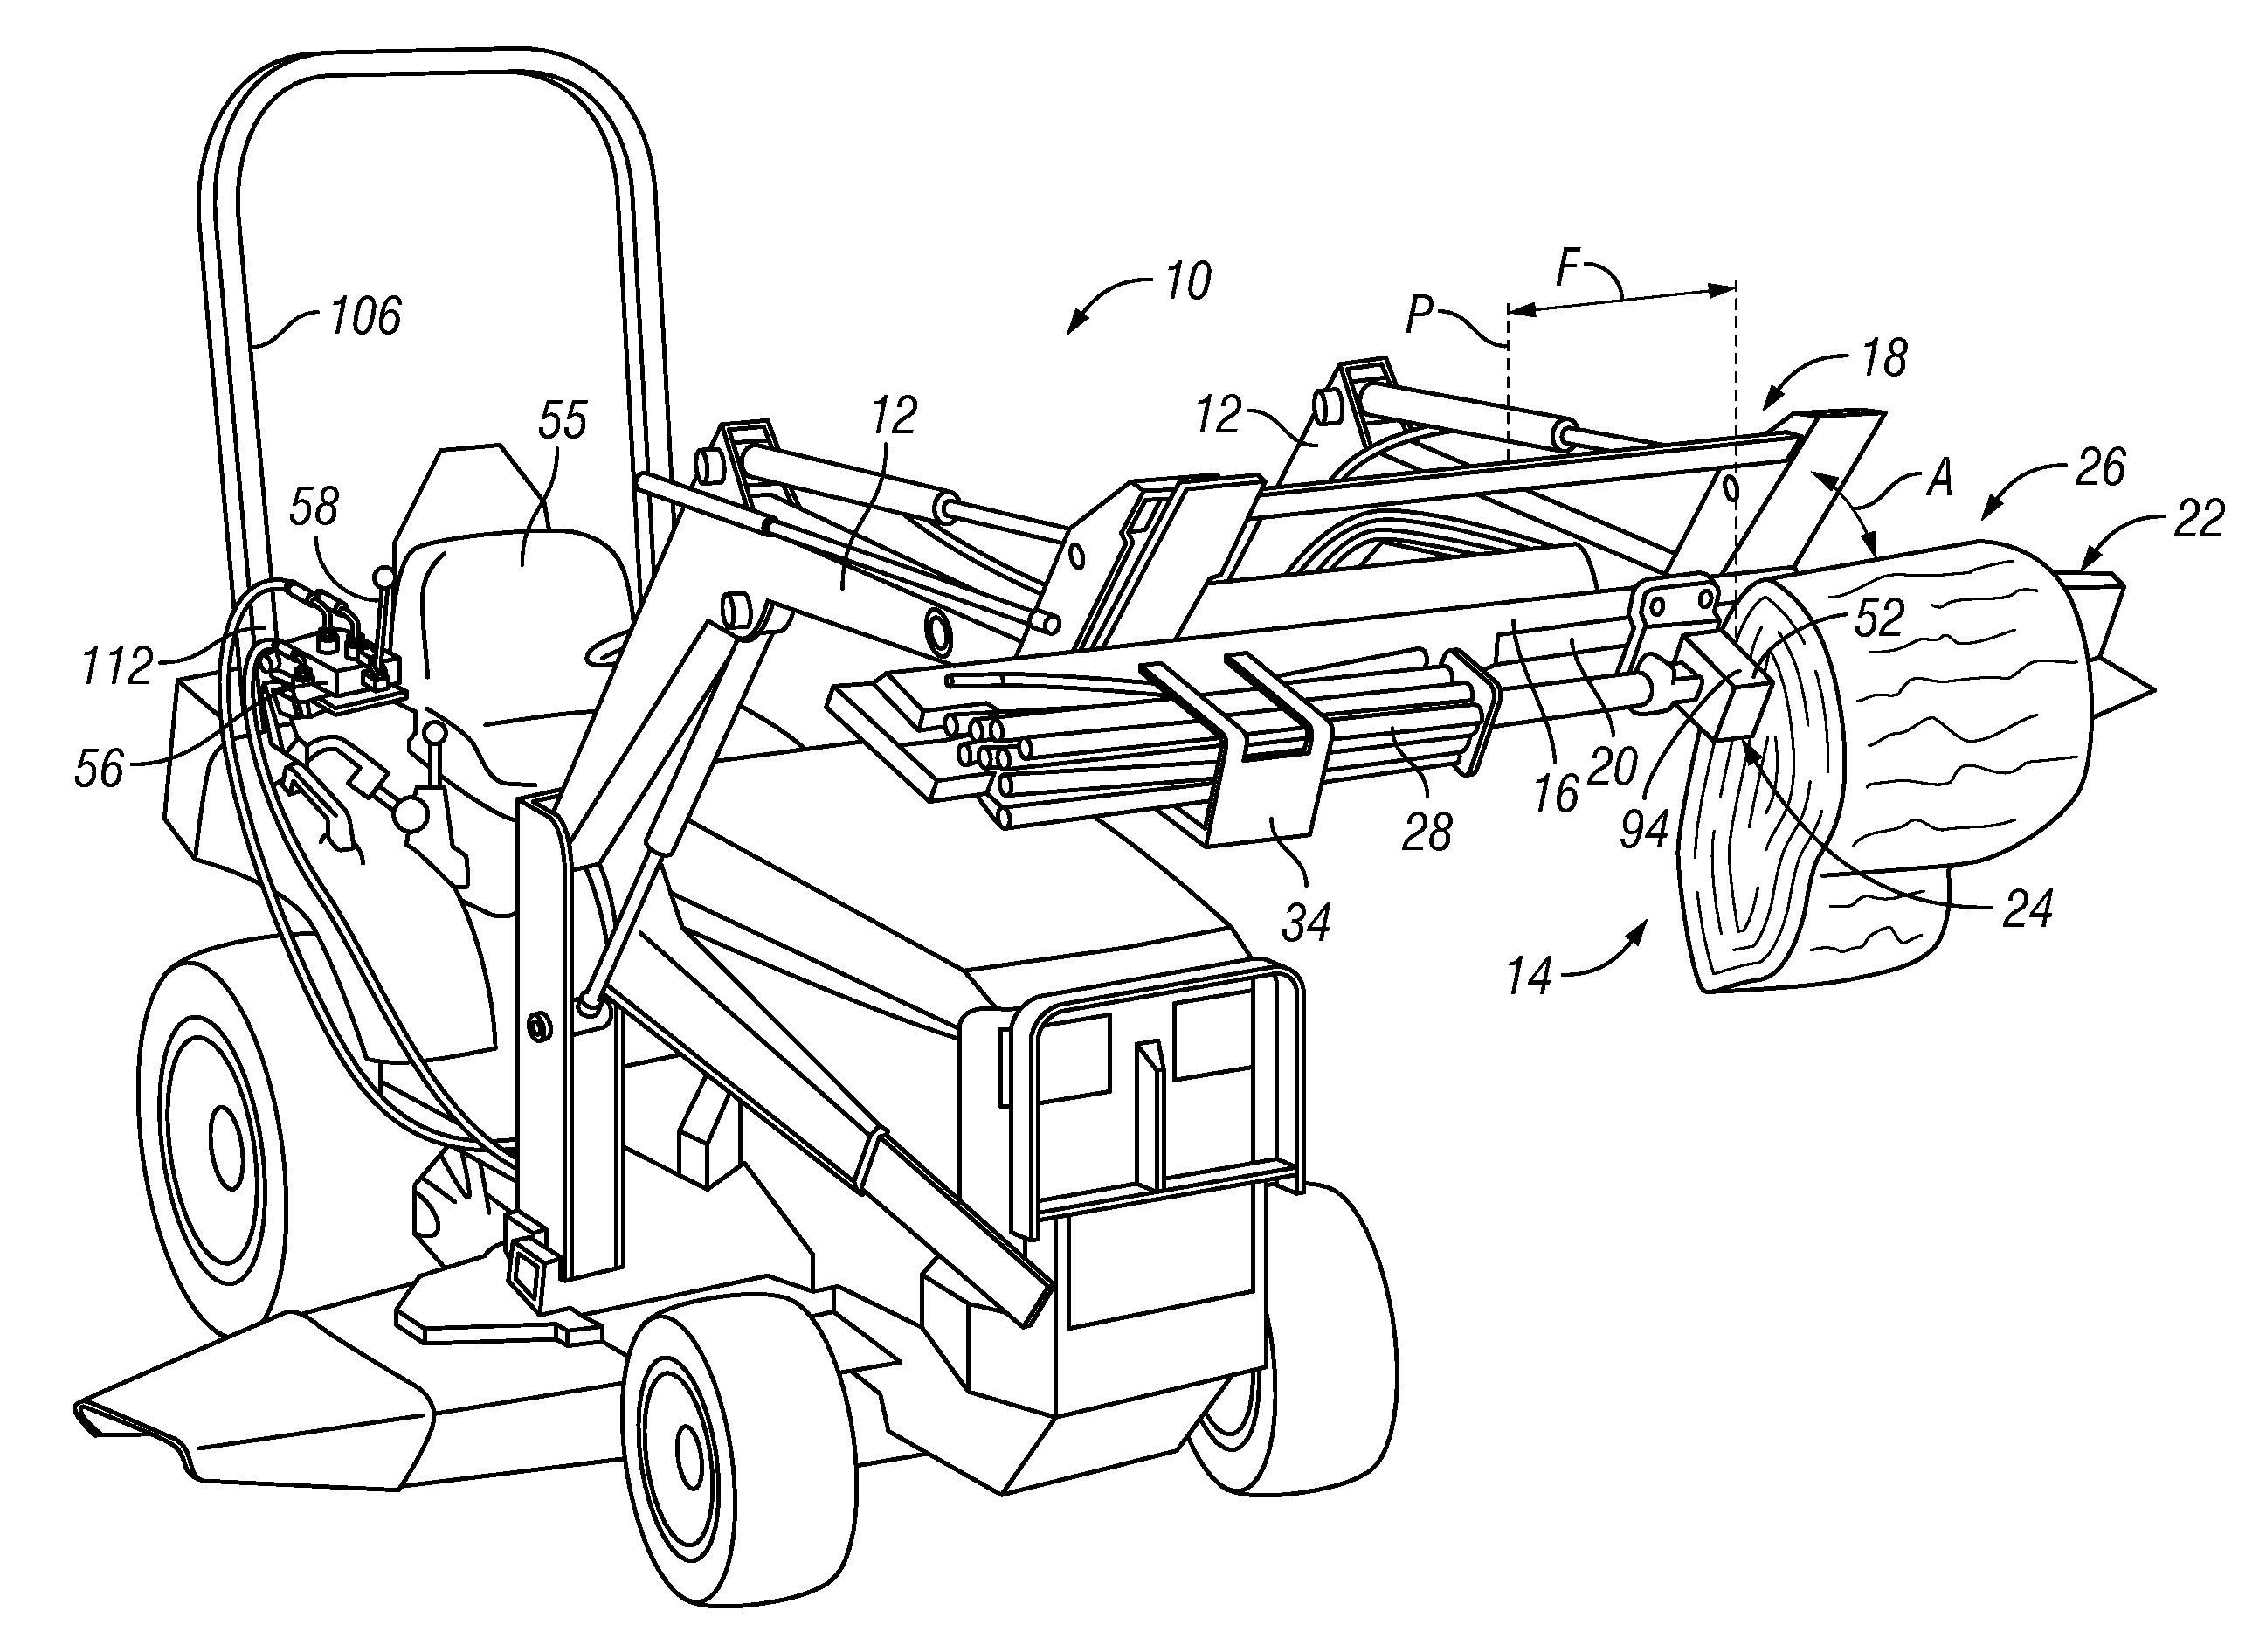 Patent Us7934524 - Log Splitter System For A Front-loader Tractor